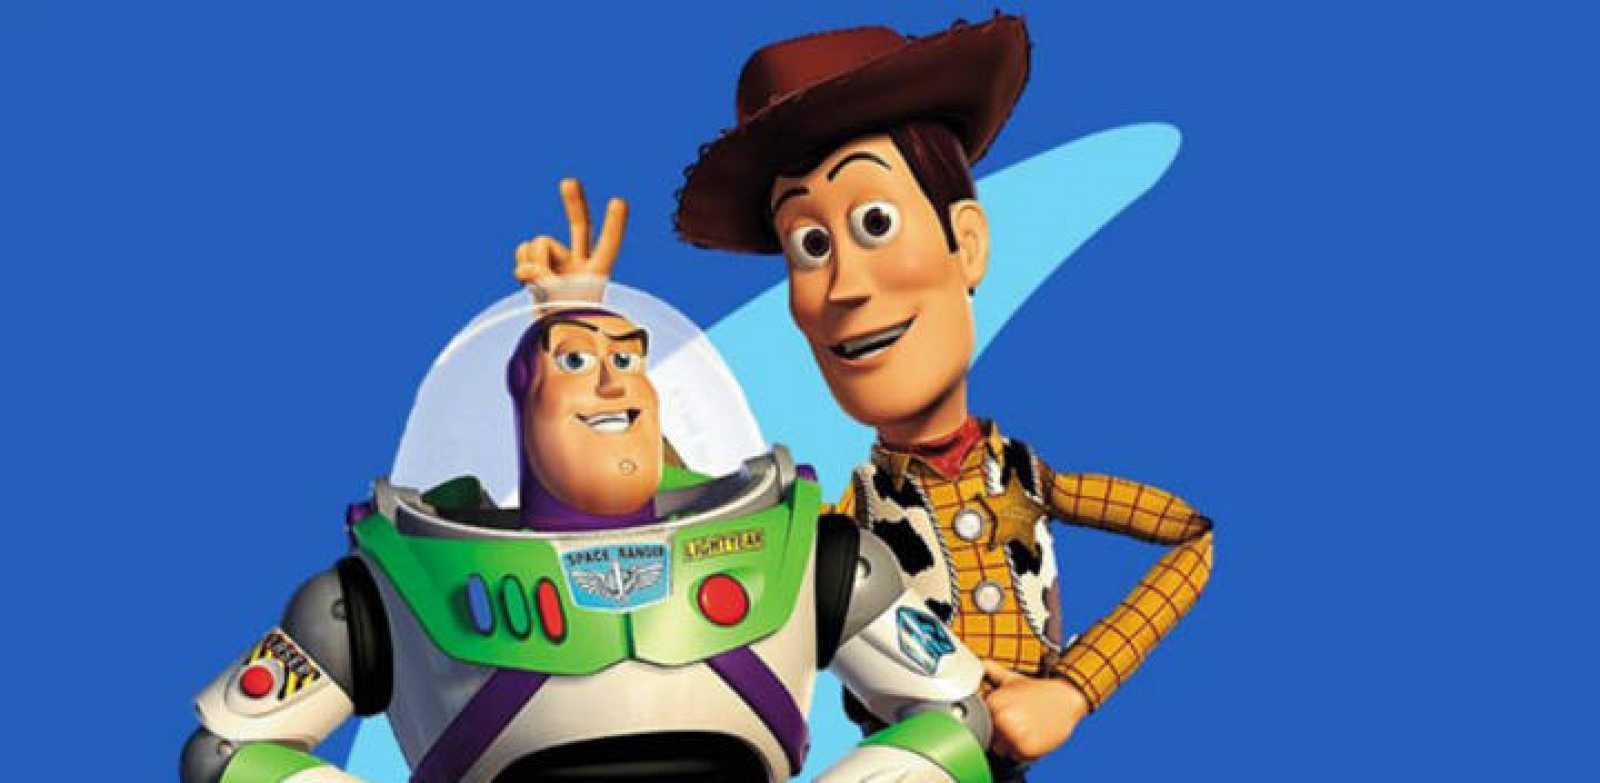 Buzz Lightyear y Woody volverán con  Toy story 4  736a035dbf6